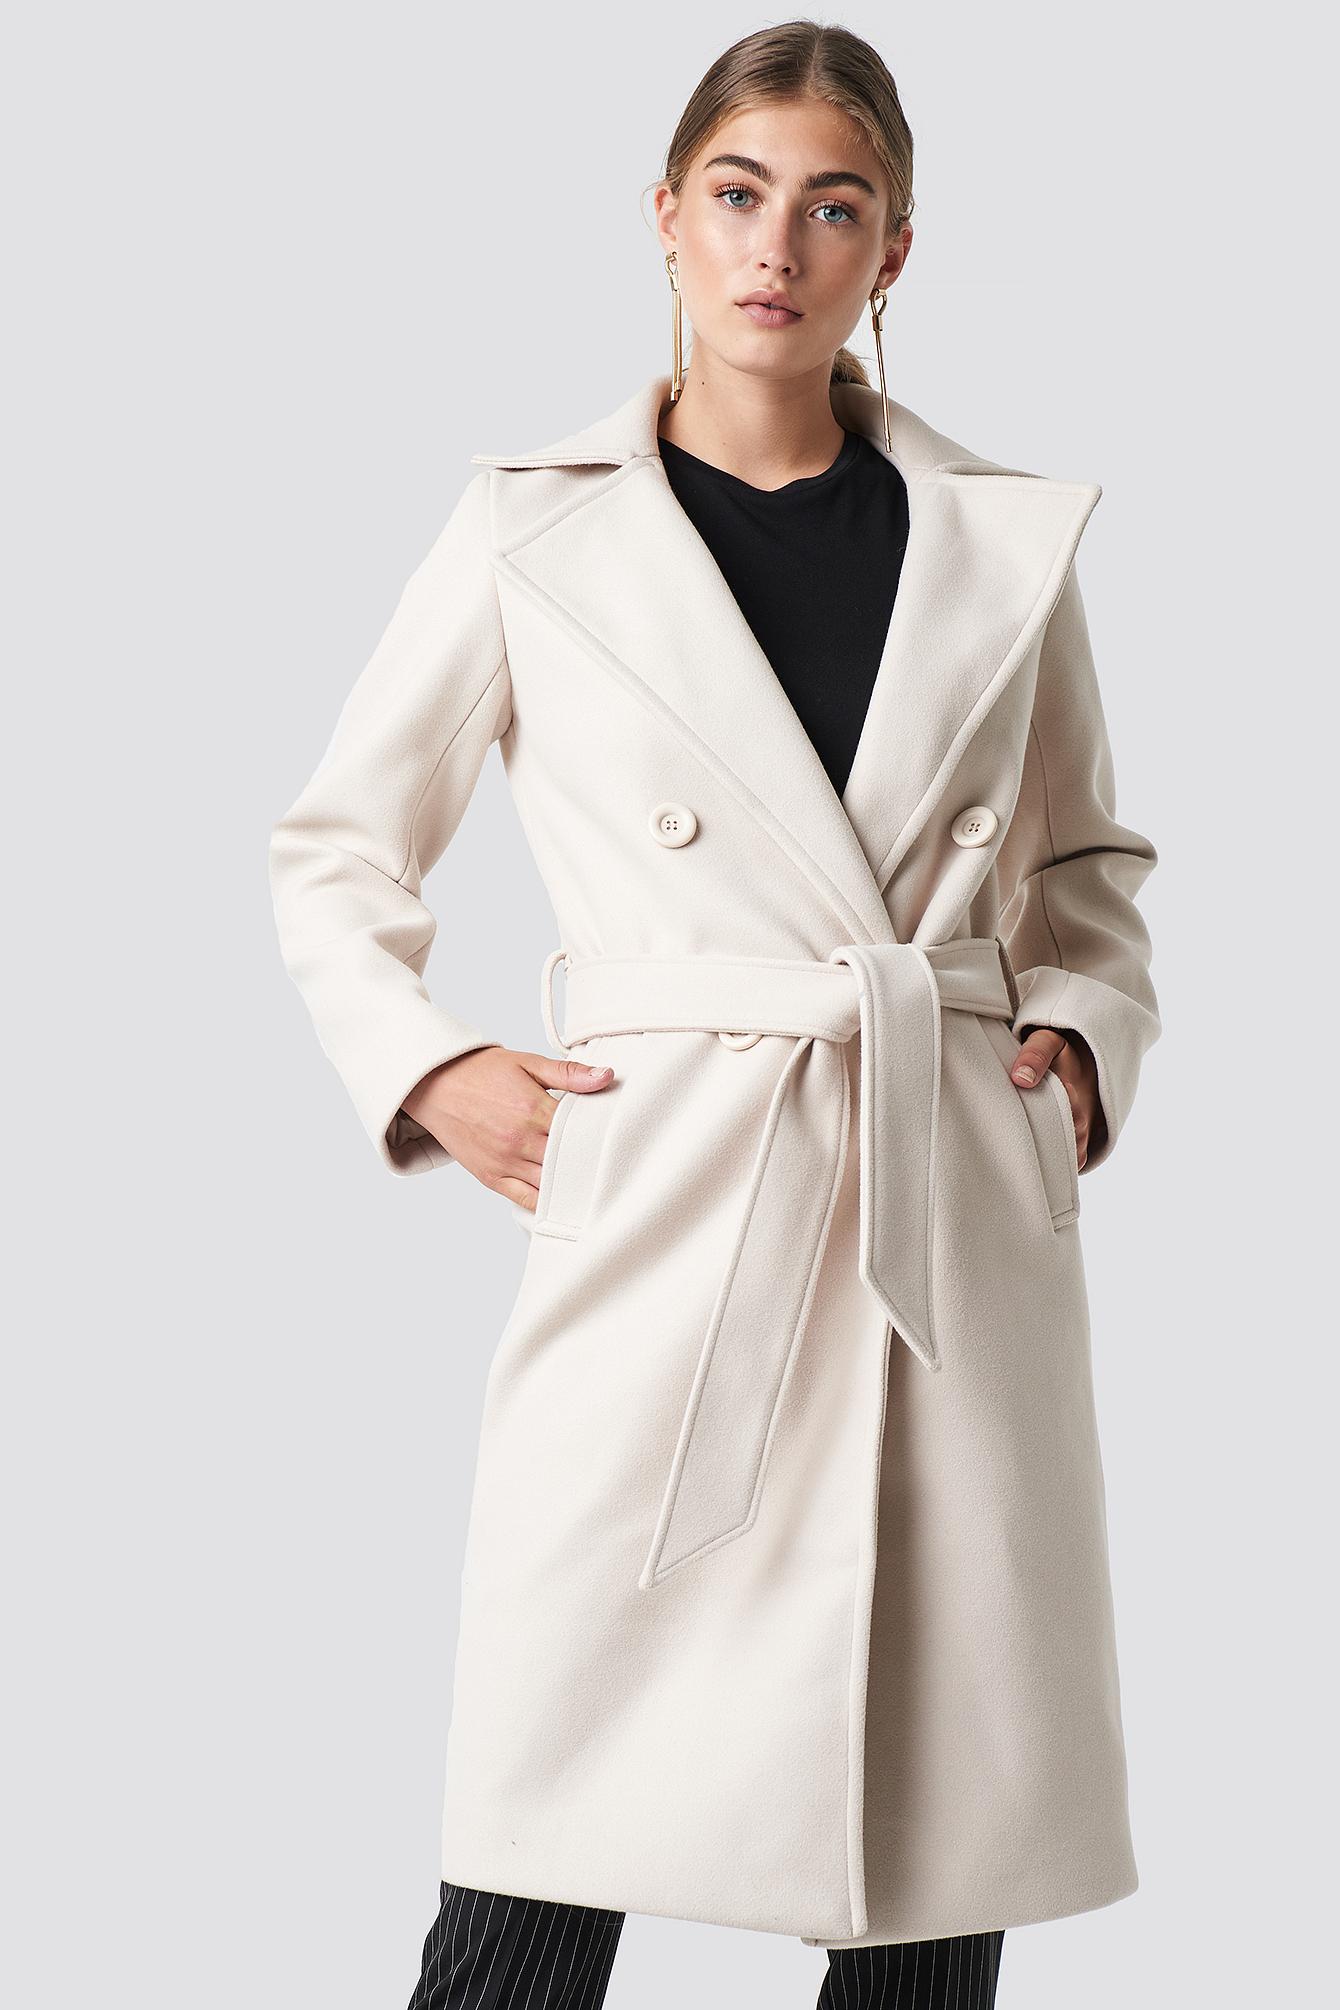 Tove Long Coat NA-KD.COM